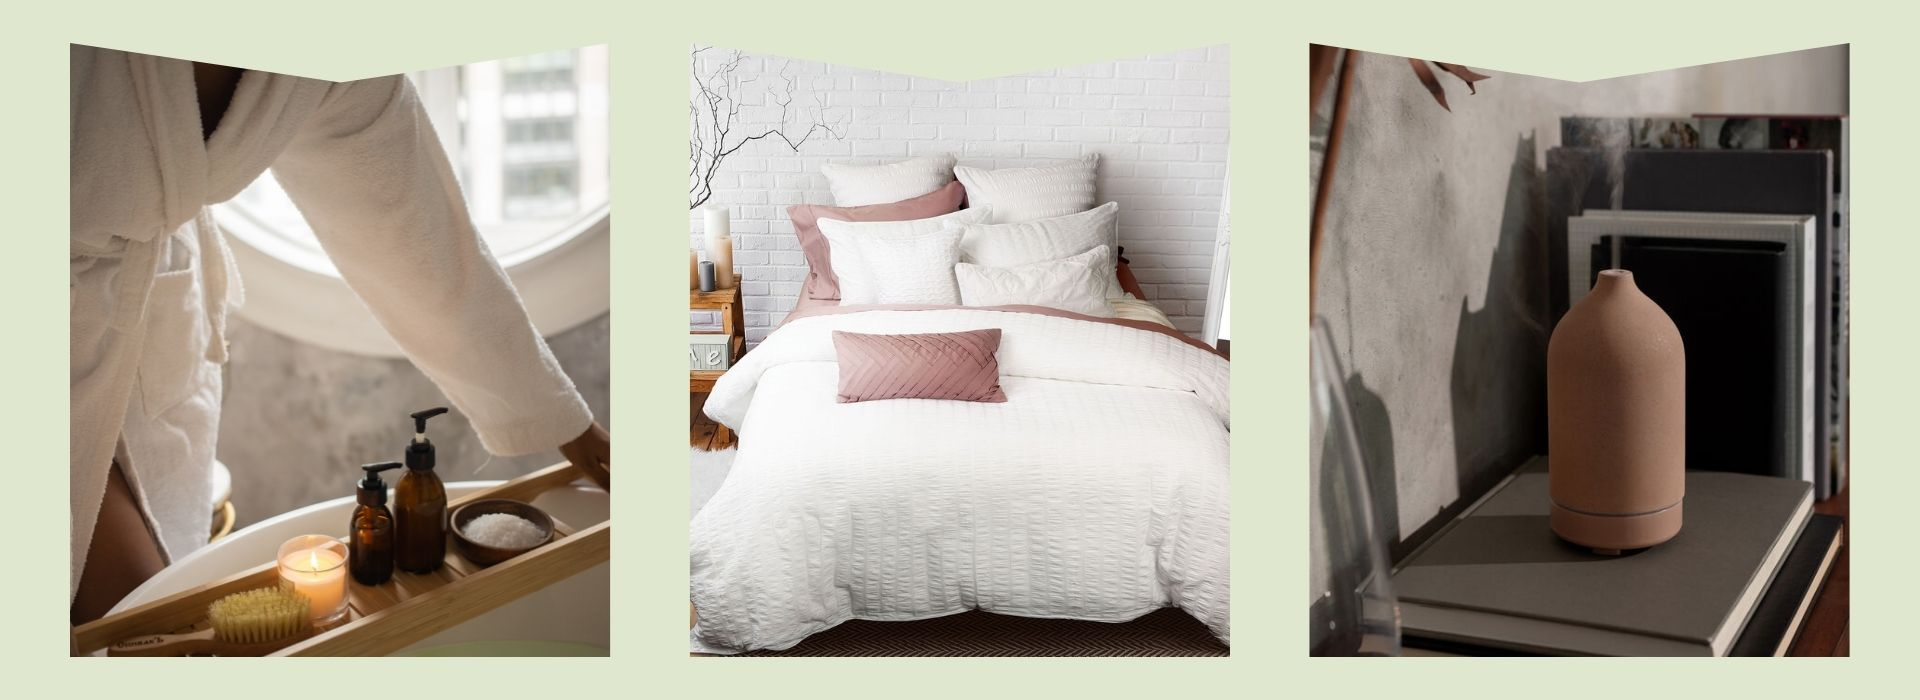 Robe, bedding, diffuser